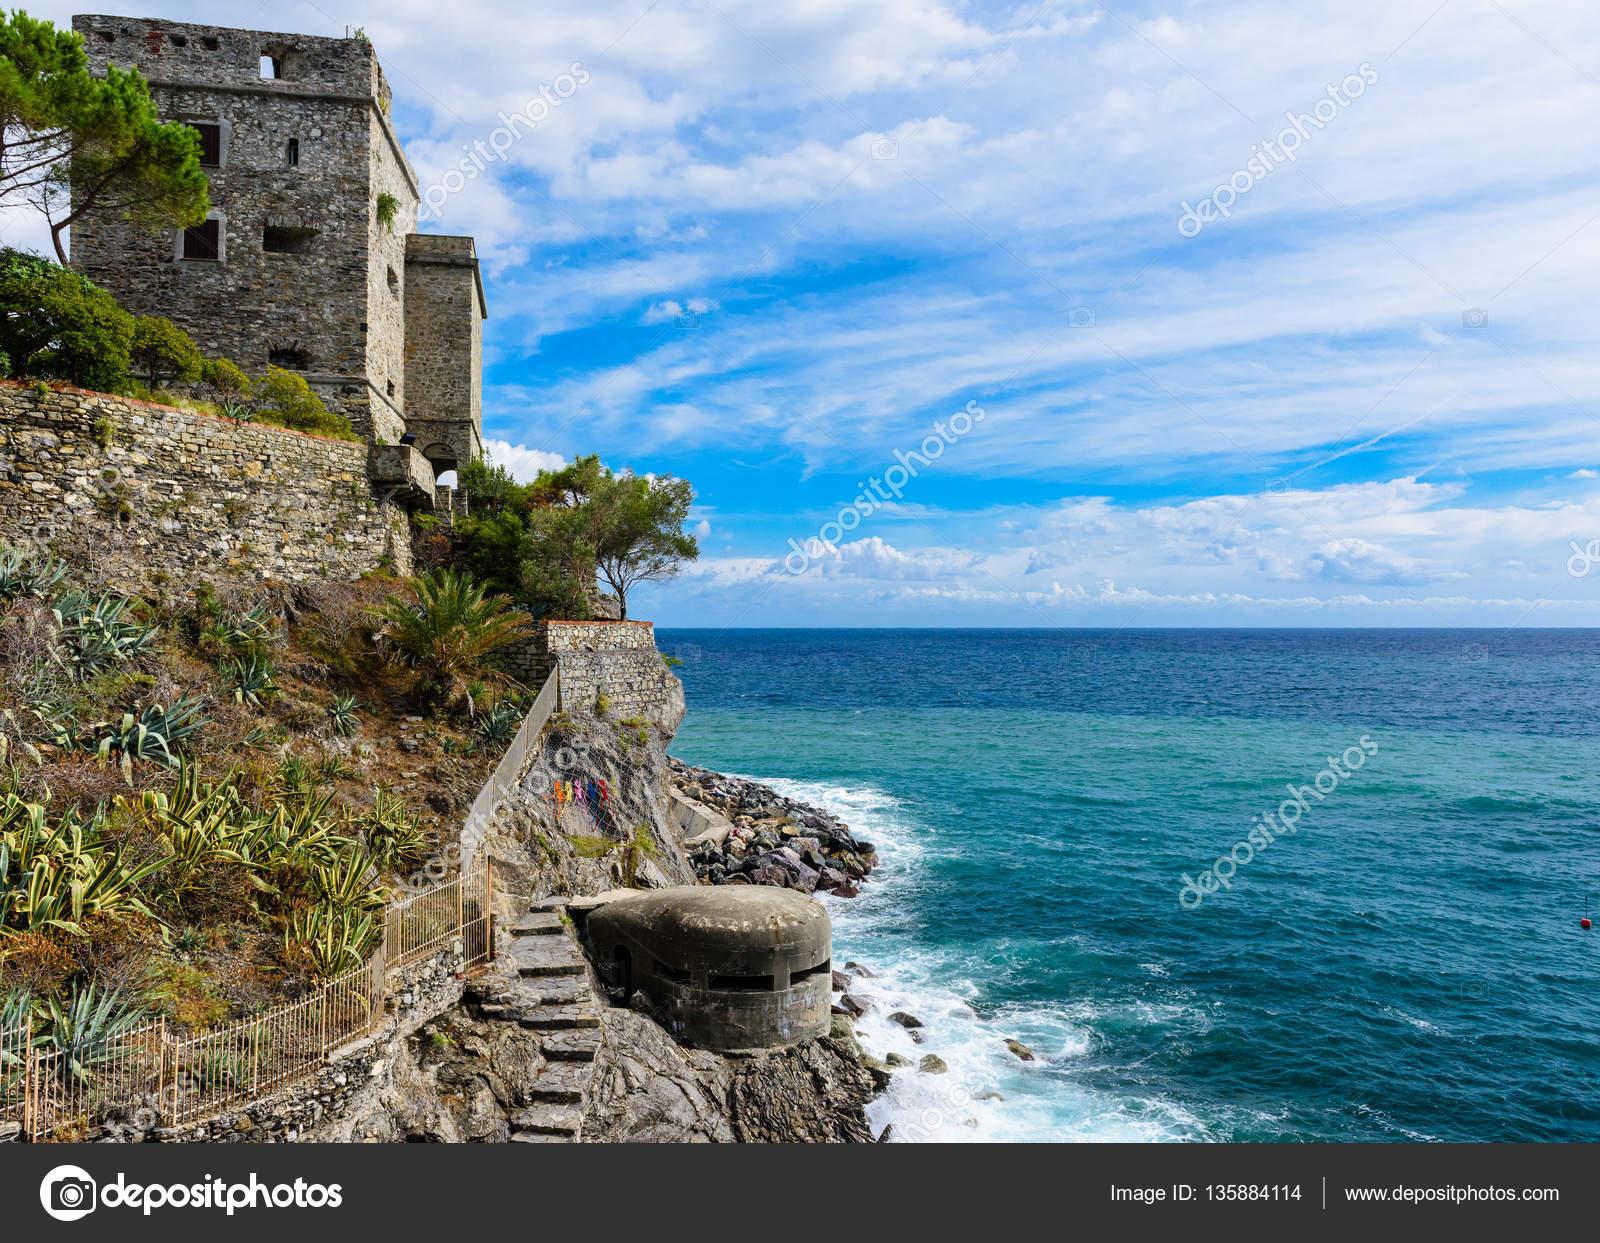 que suis -je et où? - ajonc- 25 mars bravo Jovany Depositphotos_135884114-stock-photo-dawn-tower-overlooking-the-sea